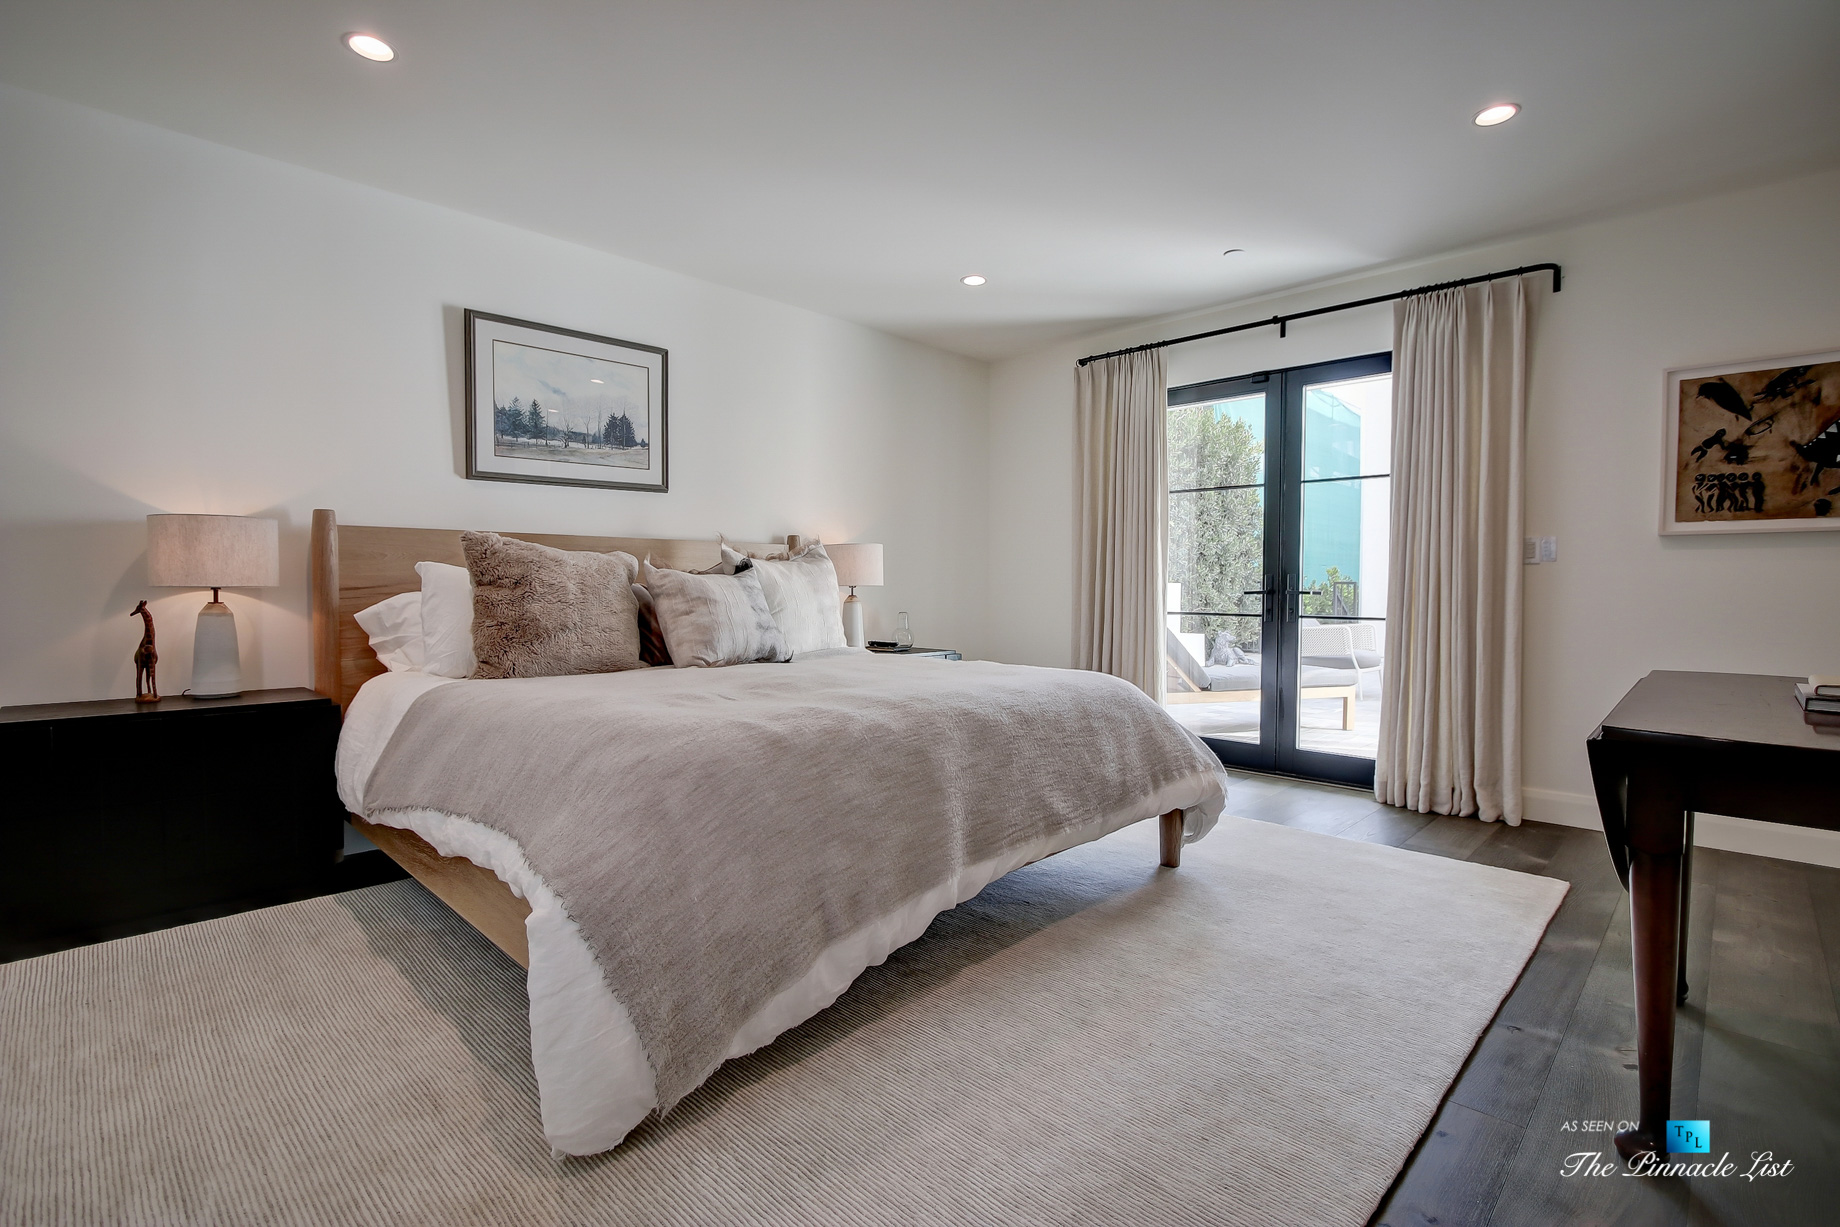 825 Highview Ave, Manhattan Beach, CA, USA - Bedroom - Luxury Real Estate - Modern Spanish Home